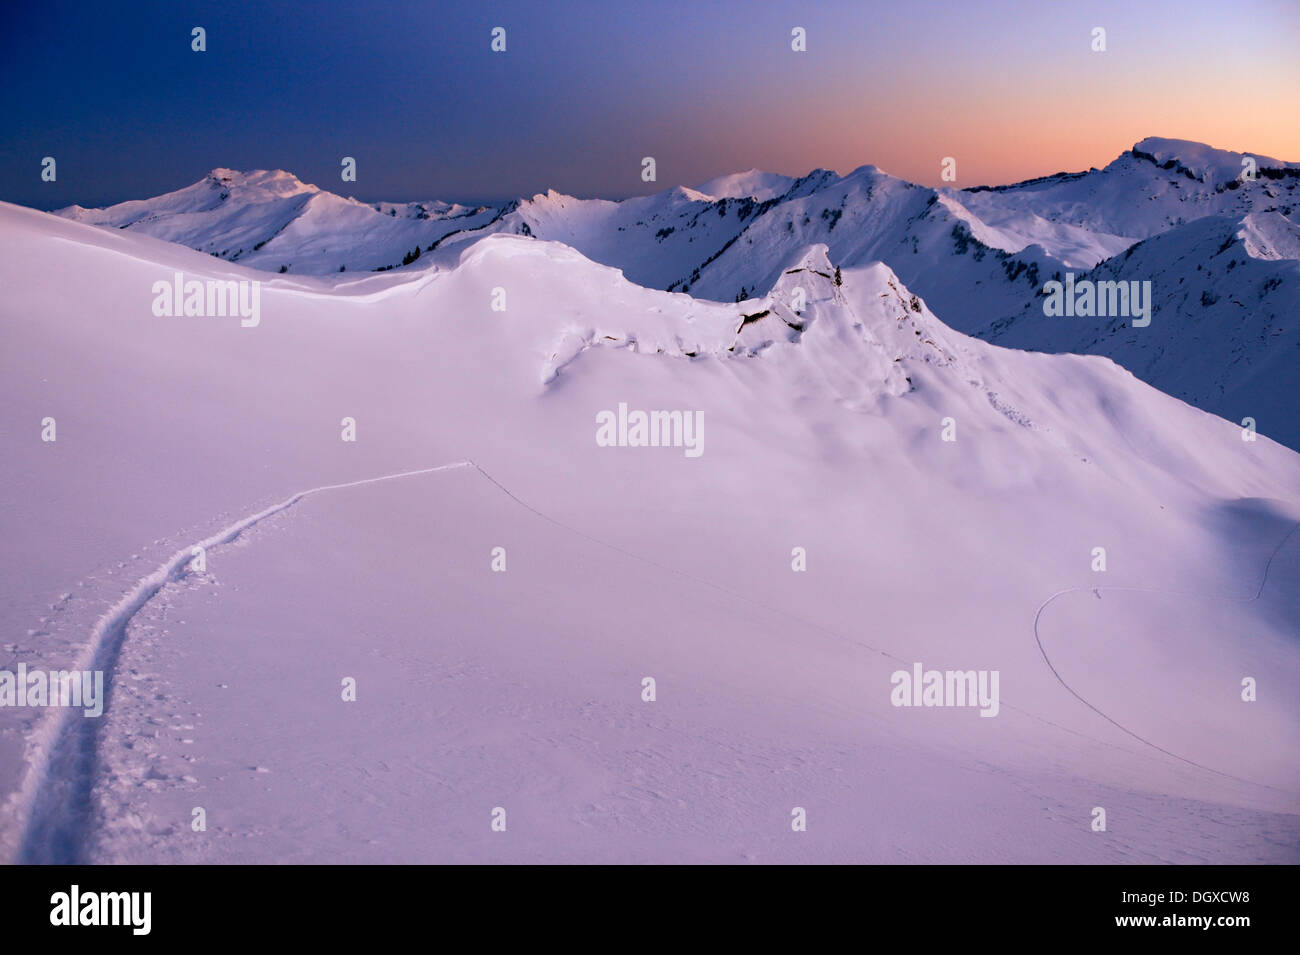 Mountain landscape with ski tracks in the pristine snow at dawn, Baad, Kleinwalsertal, Vorarlberg, Austria Stock Photo